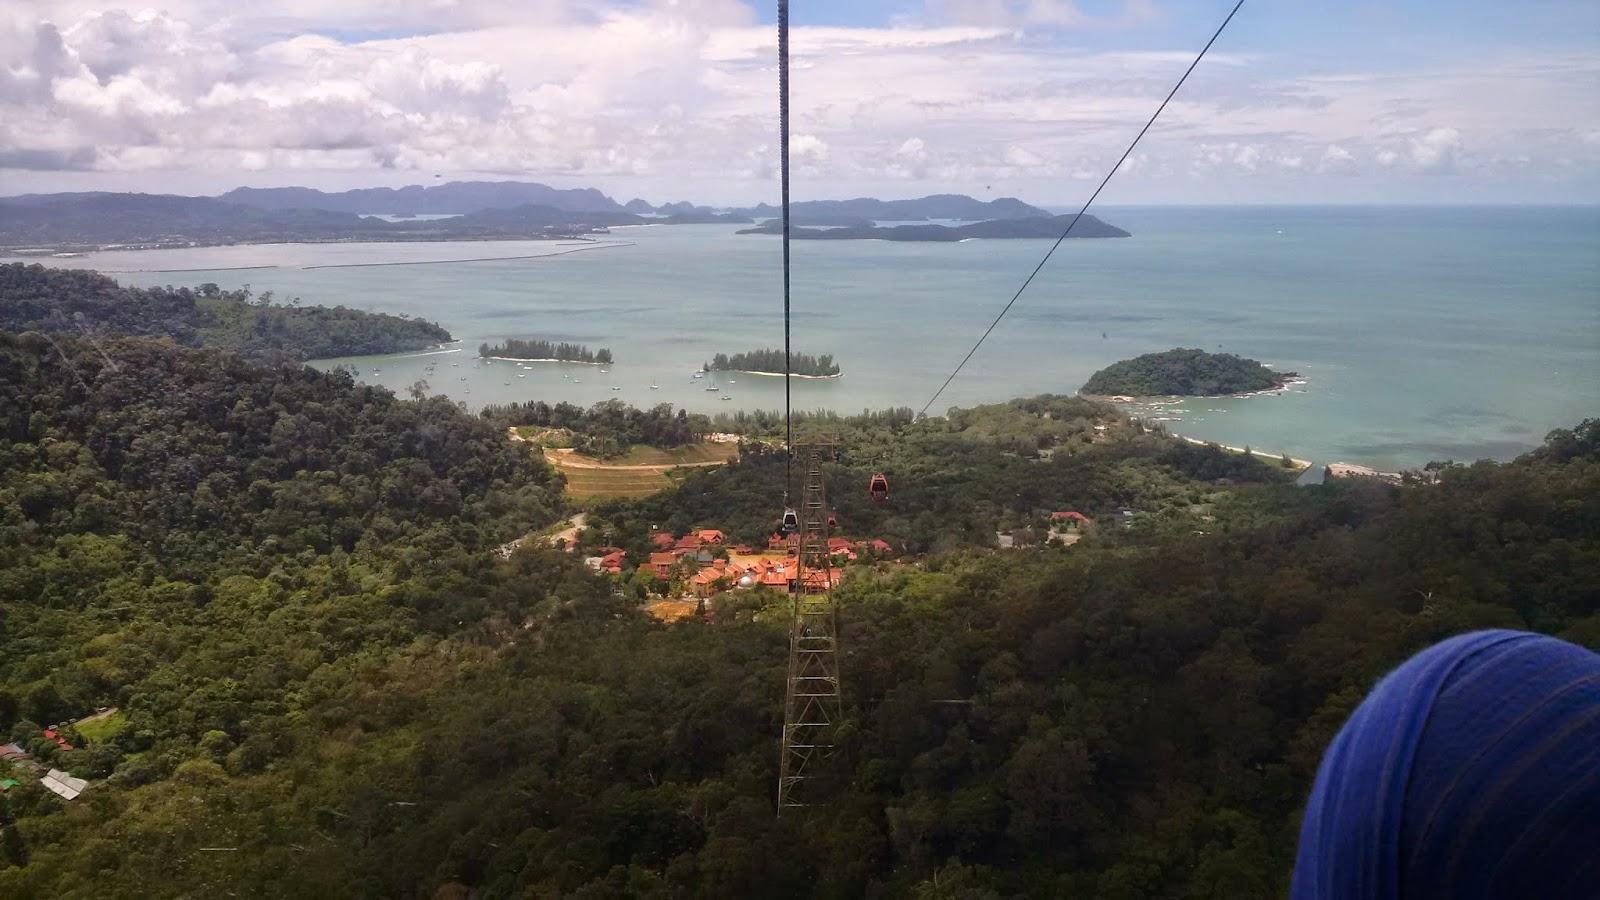 panorama,panorama langkawi,langkawi cablecar,langkawi cable car,skycab,skybridge,prasarana,kereta kabel langkawi,langkawi, malaysia, sky adventures, panorama langkawy sky cab, travel, tourism